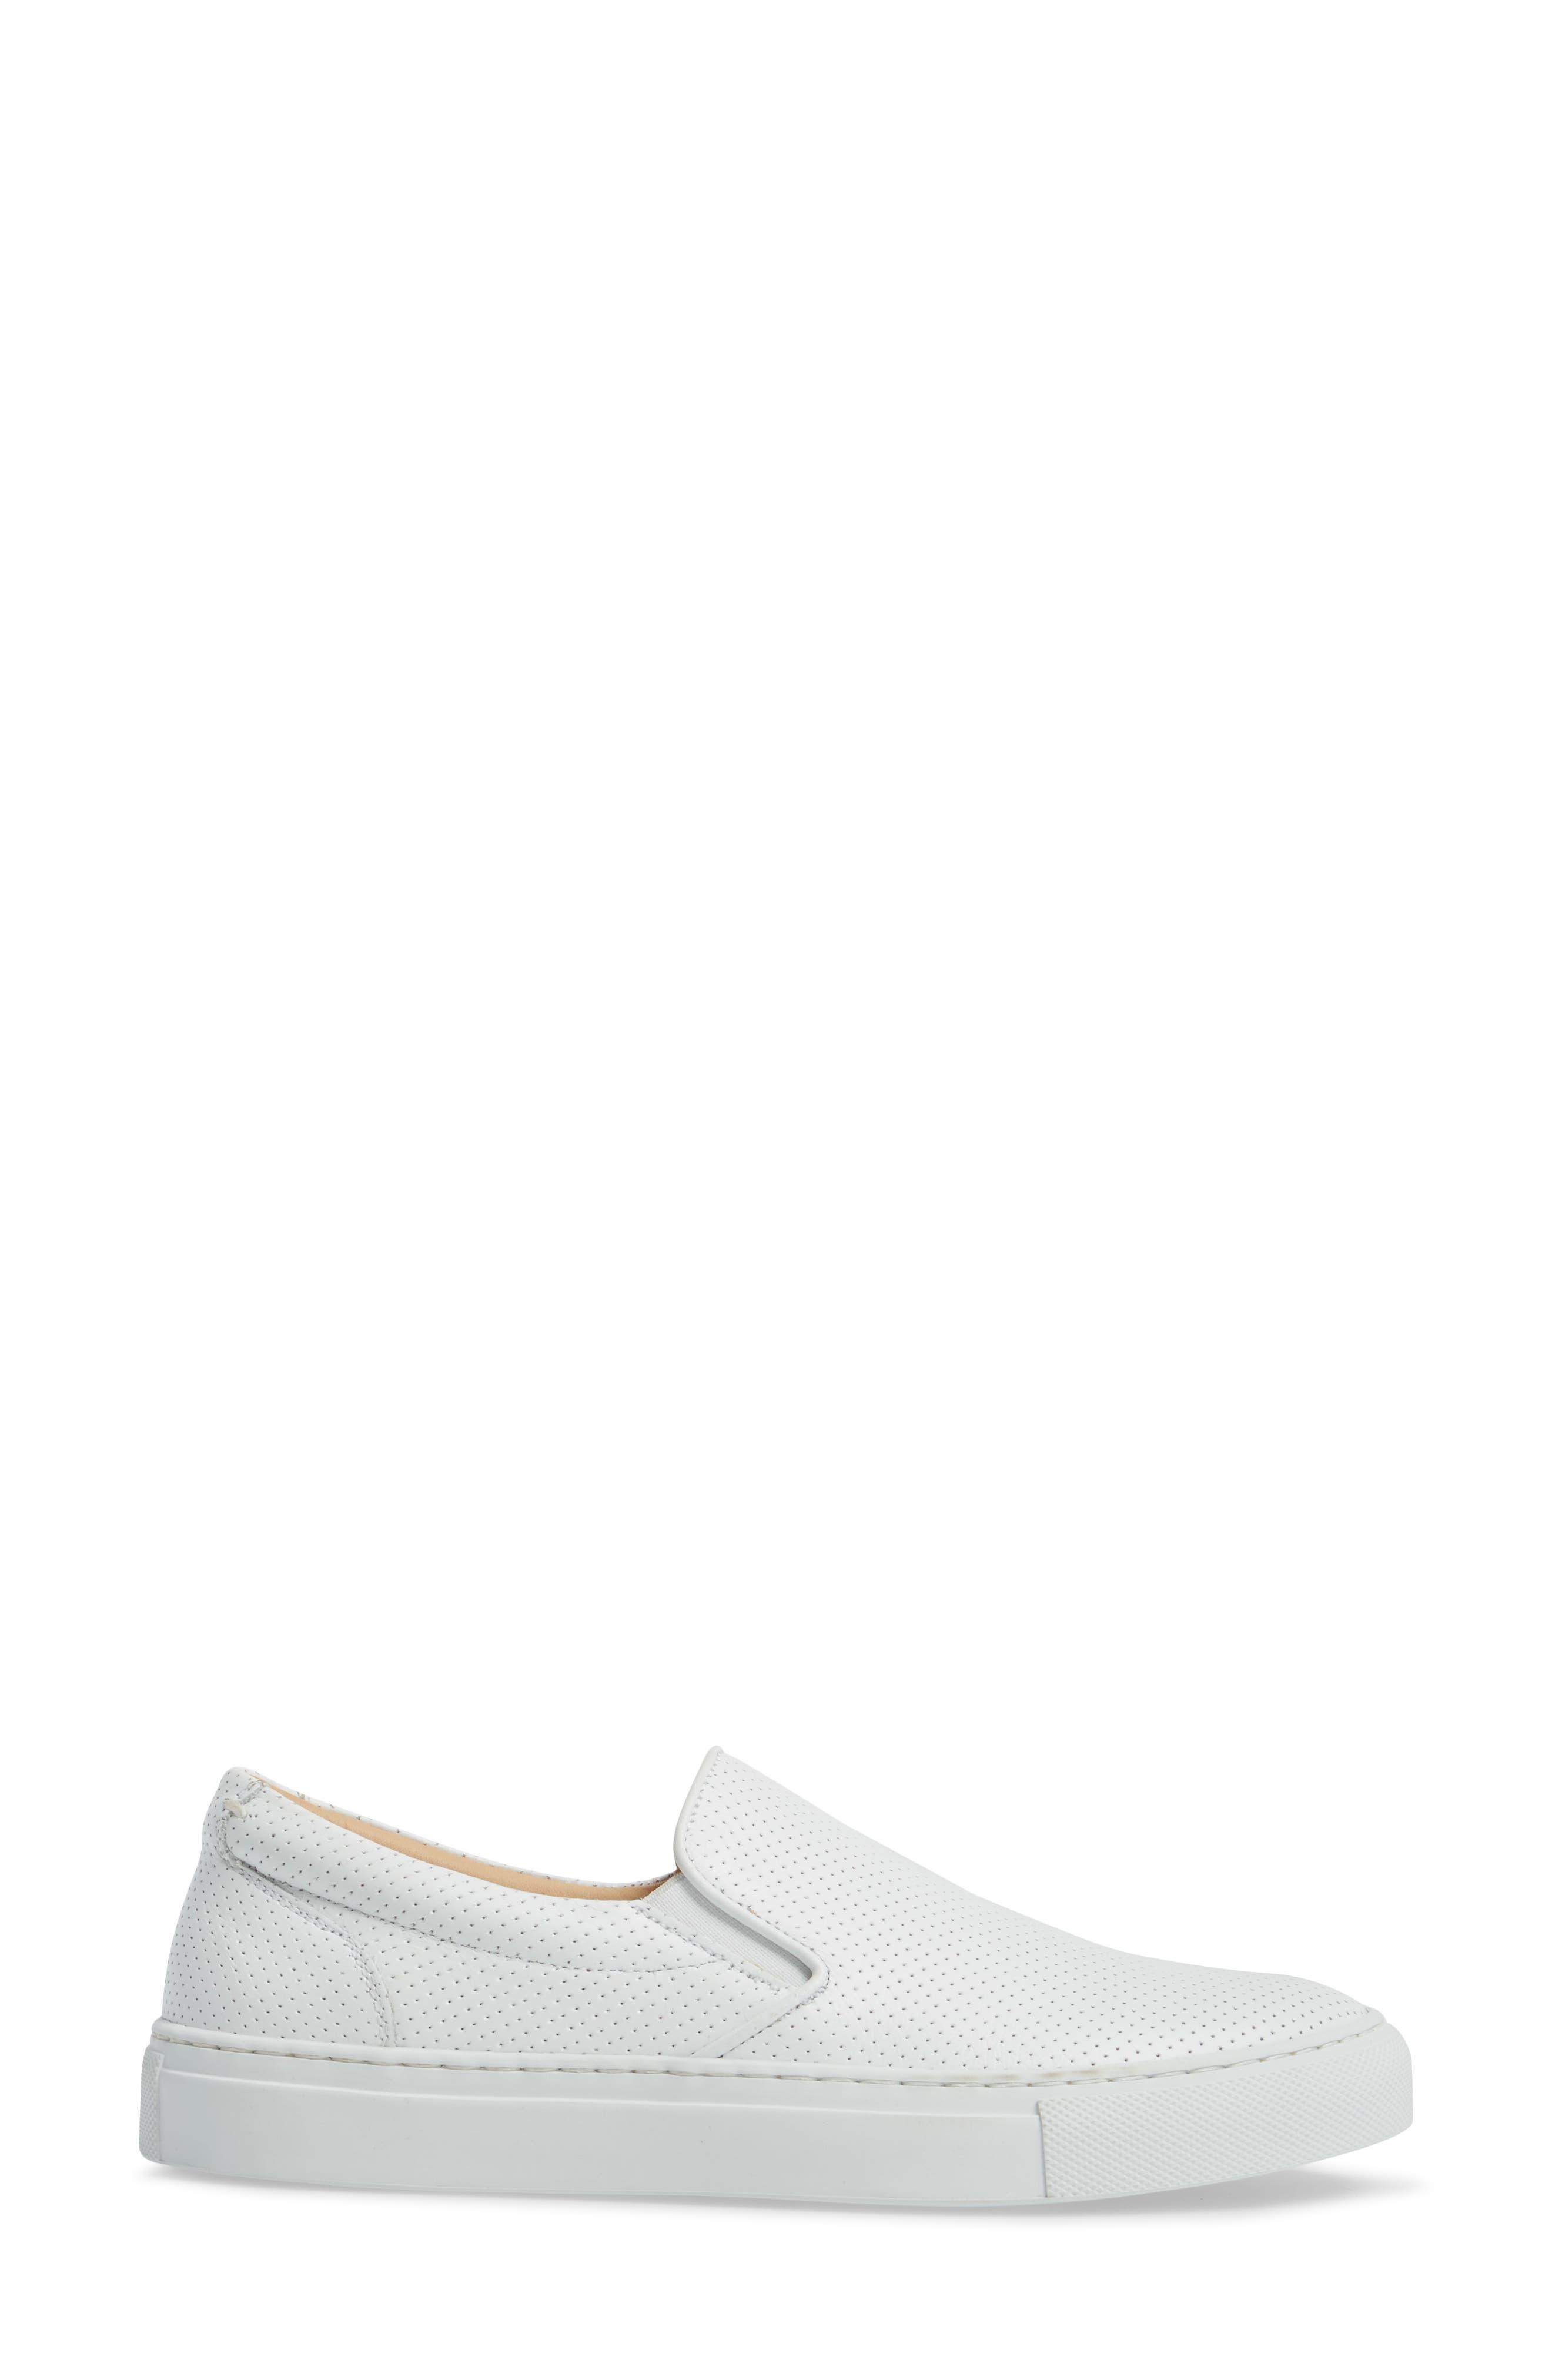 Wooster Slip-On Sneaker,                             Alternate thumbnail 3, color,                             WHITE PERFORATED